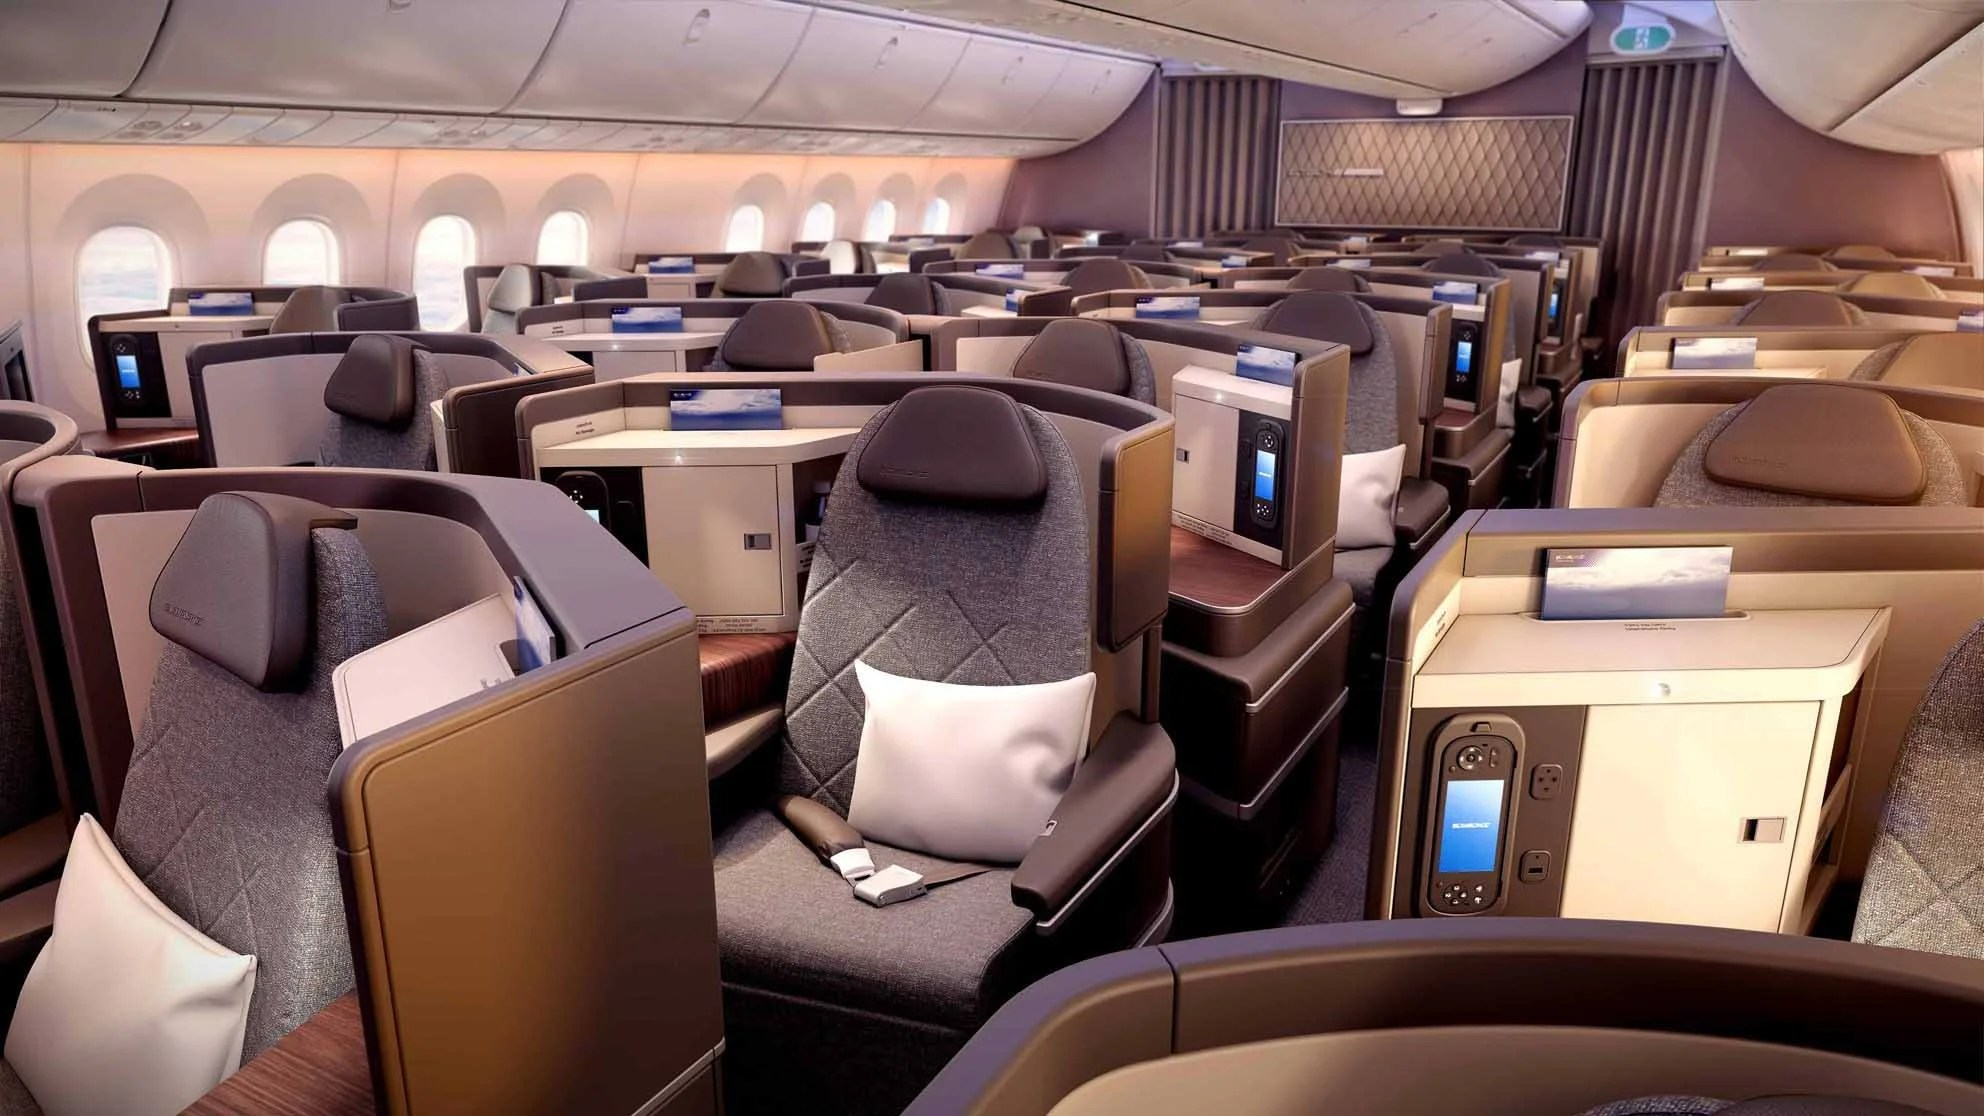 A look inside el al 39 s new 787 9 dreamliners for Interieur avion easyjet